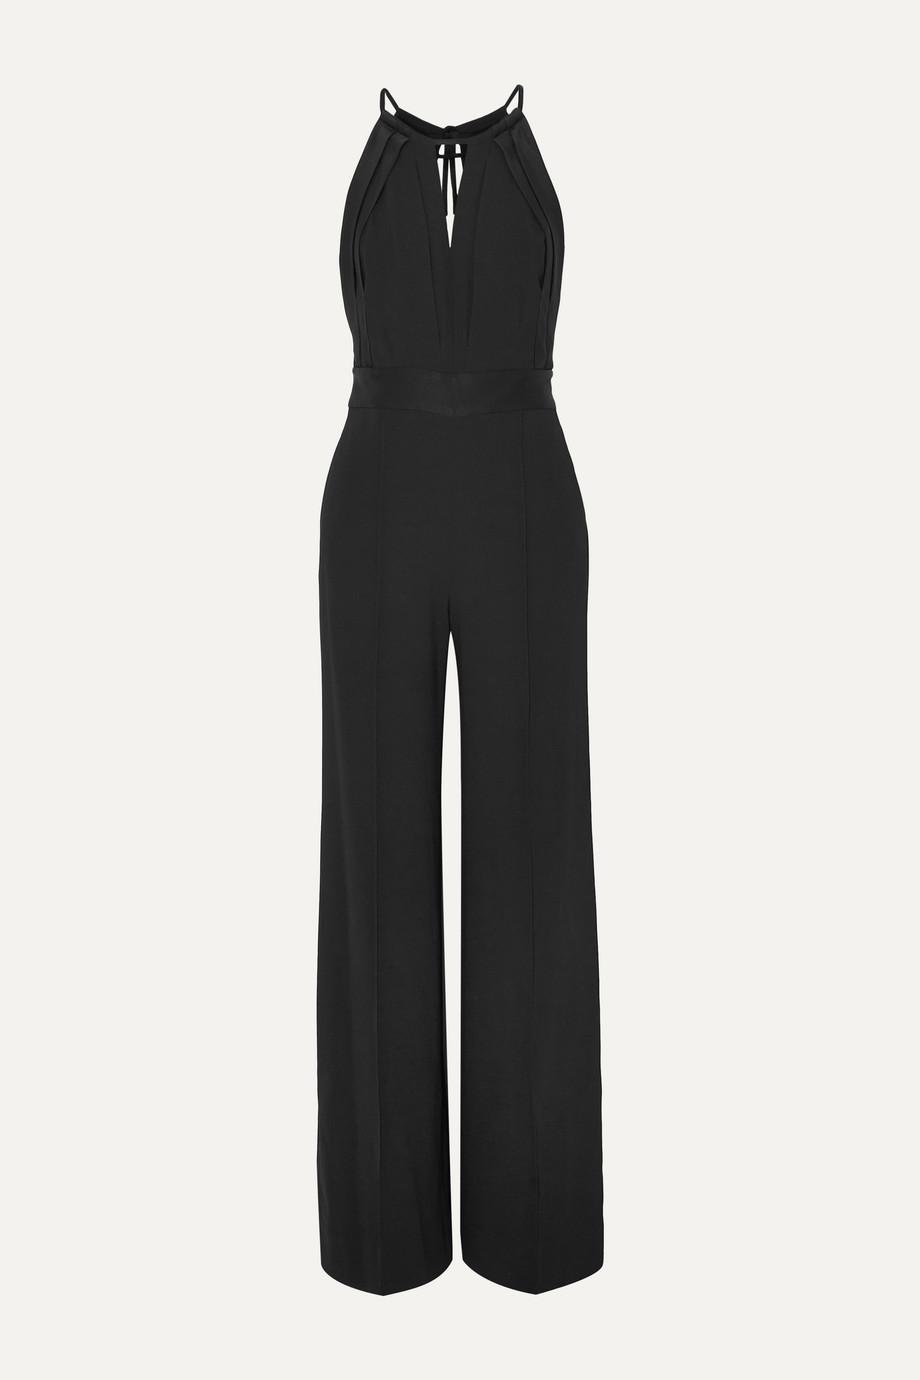 Diane von Furstenberg Ireland open-back satin-trimmed crepe halterneck jumpsuit